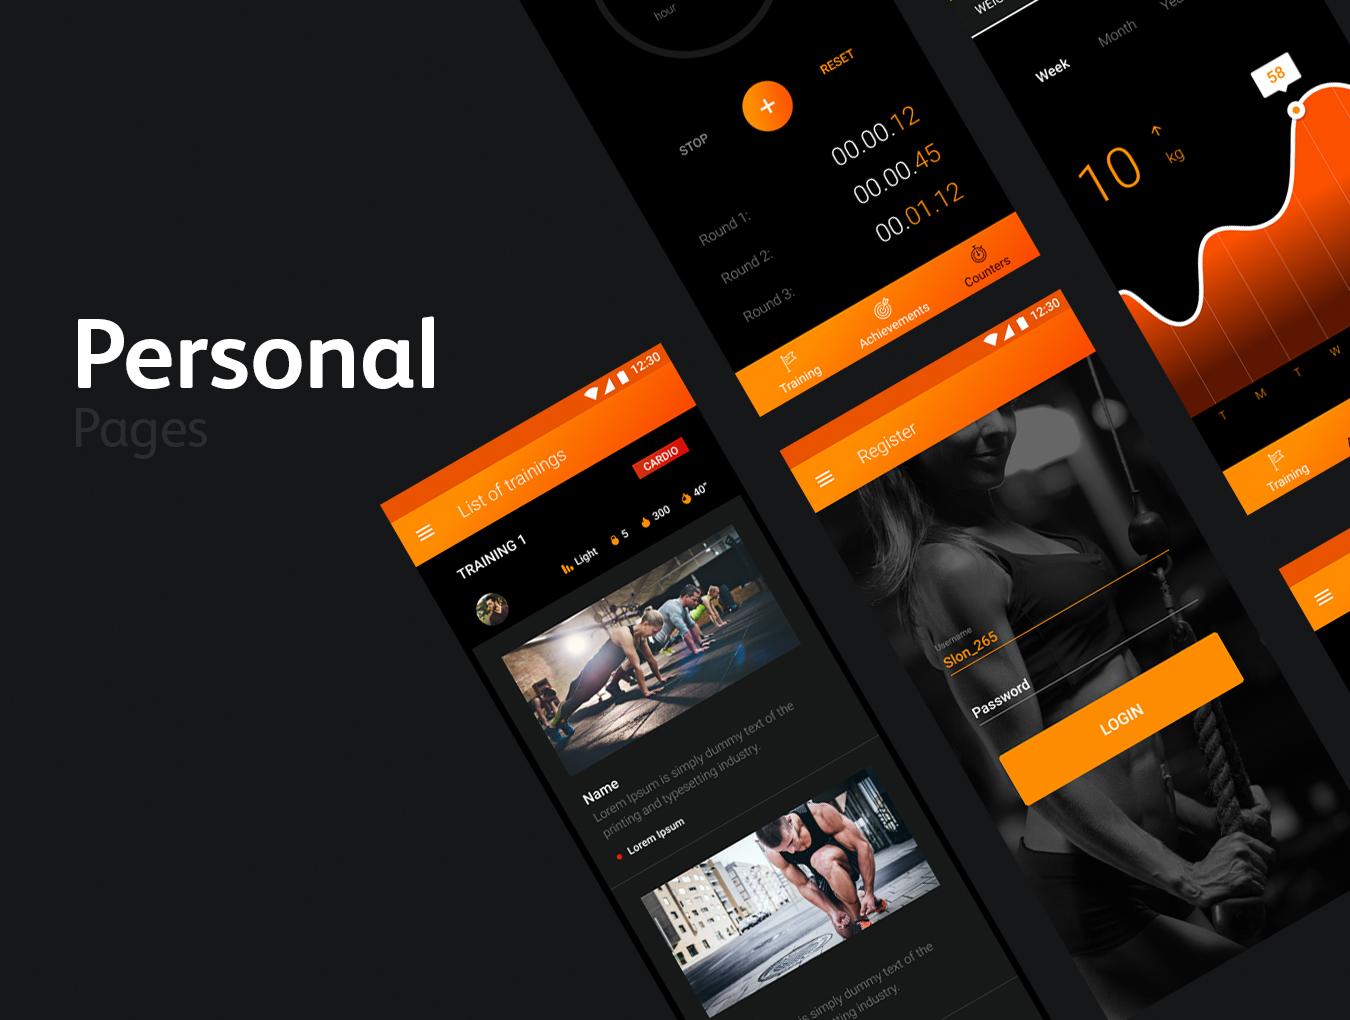 高质量健身旅行商城购物Android UI工具包 FIT BIT Sport UI Kit插图(2)